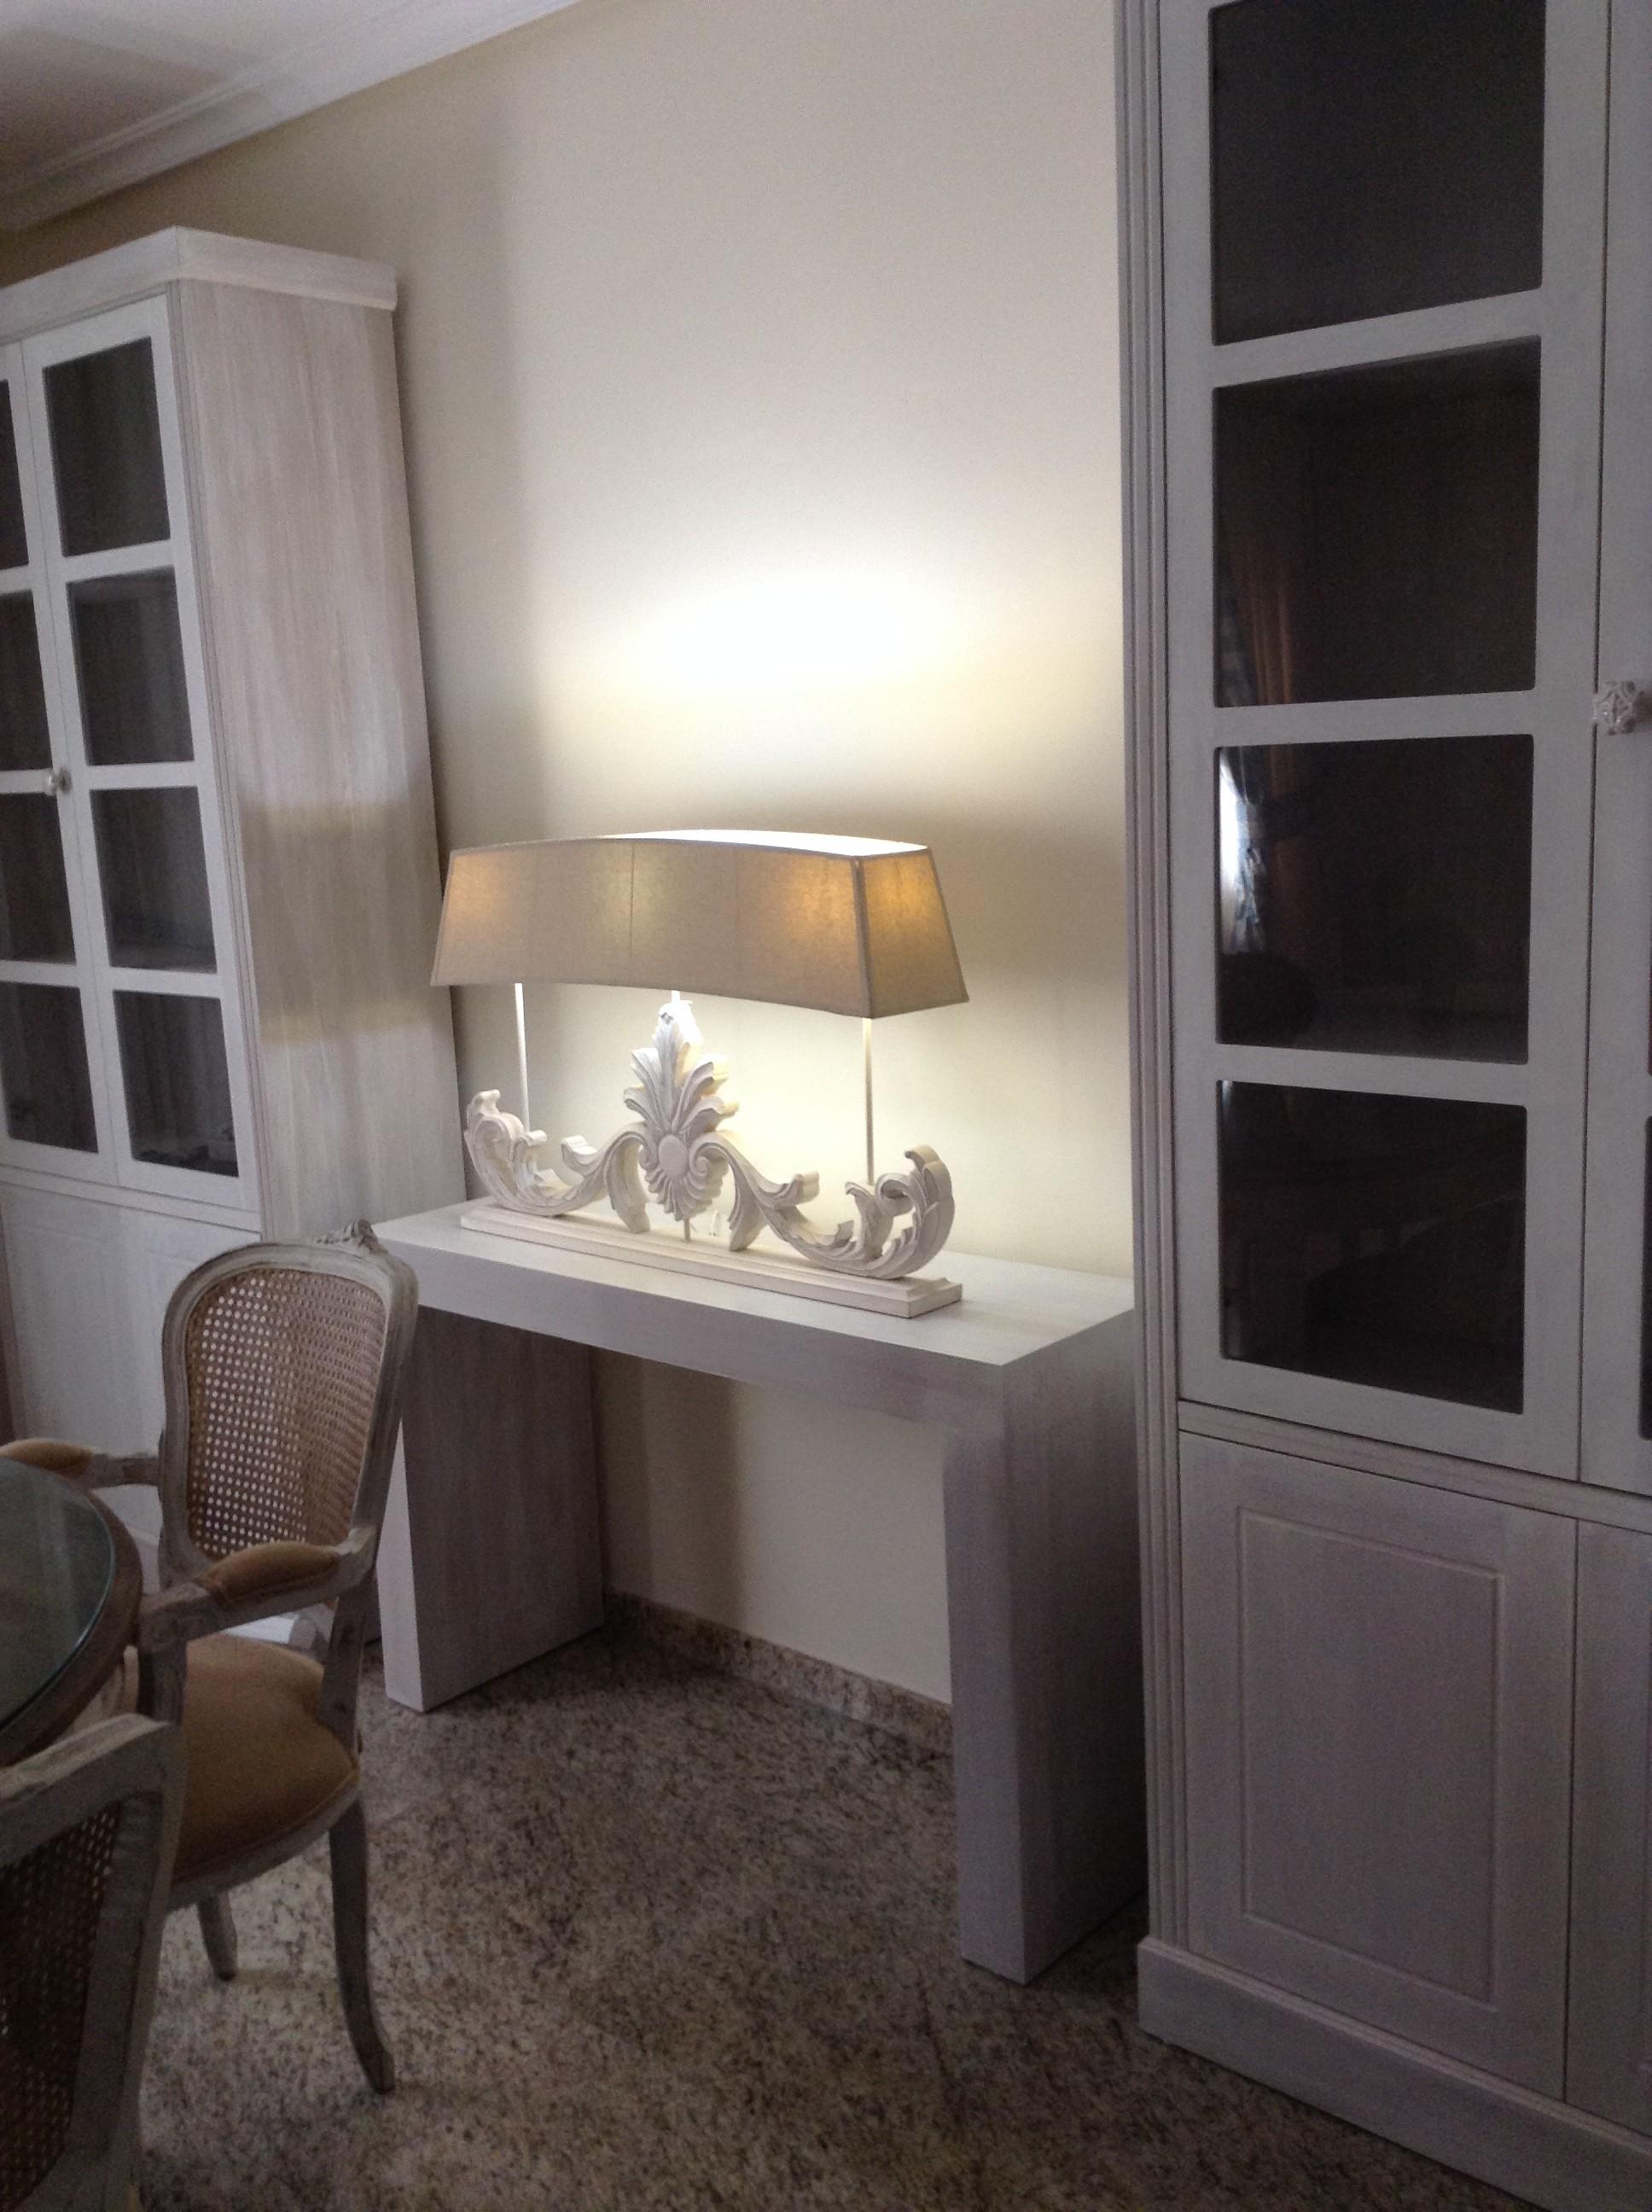 consola a medida con lámpara de estilo francés